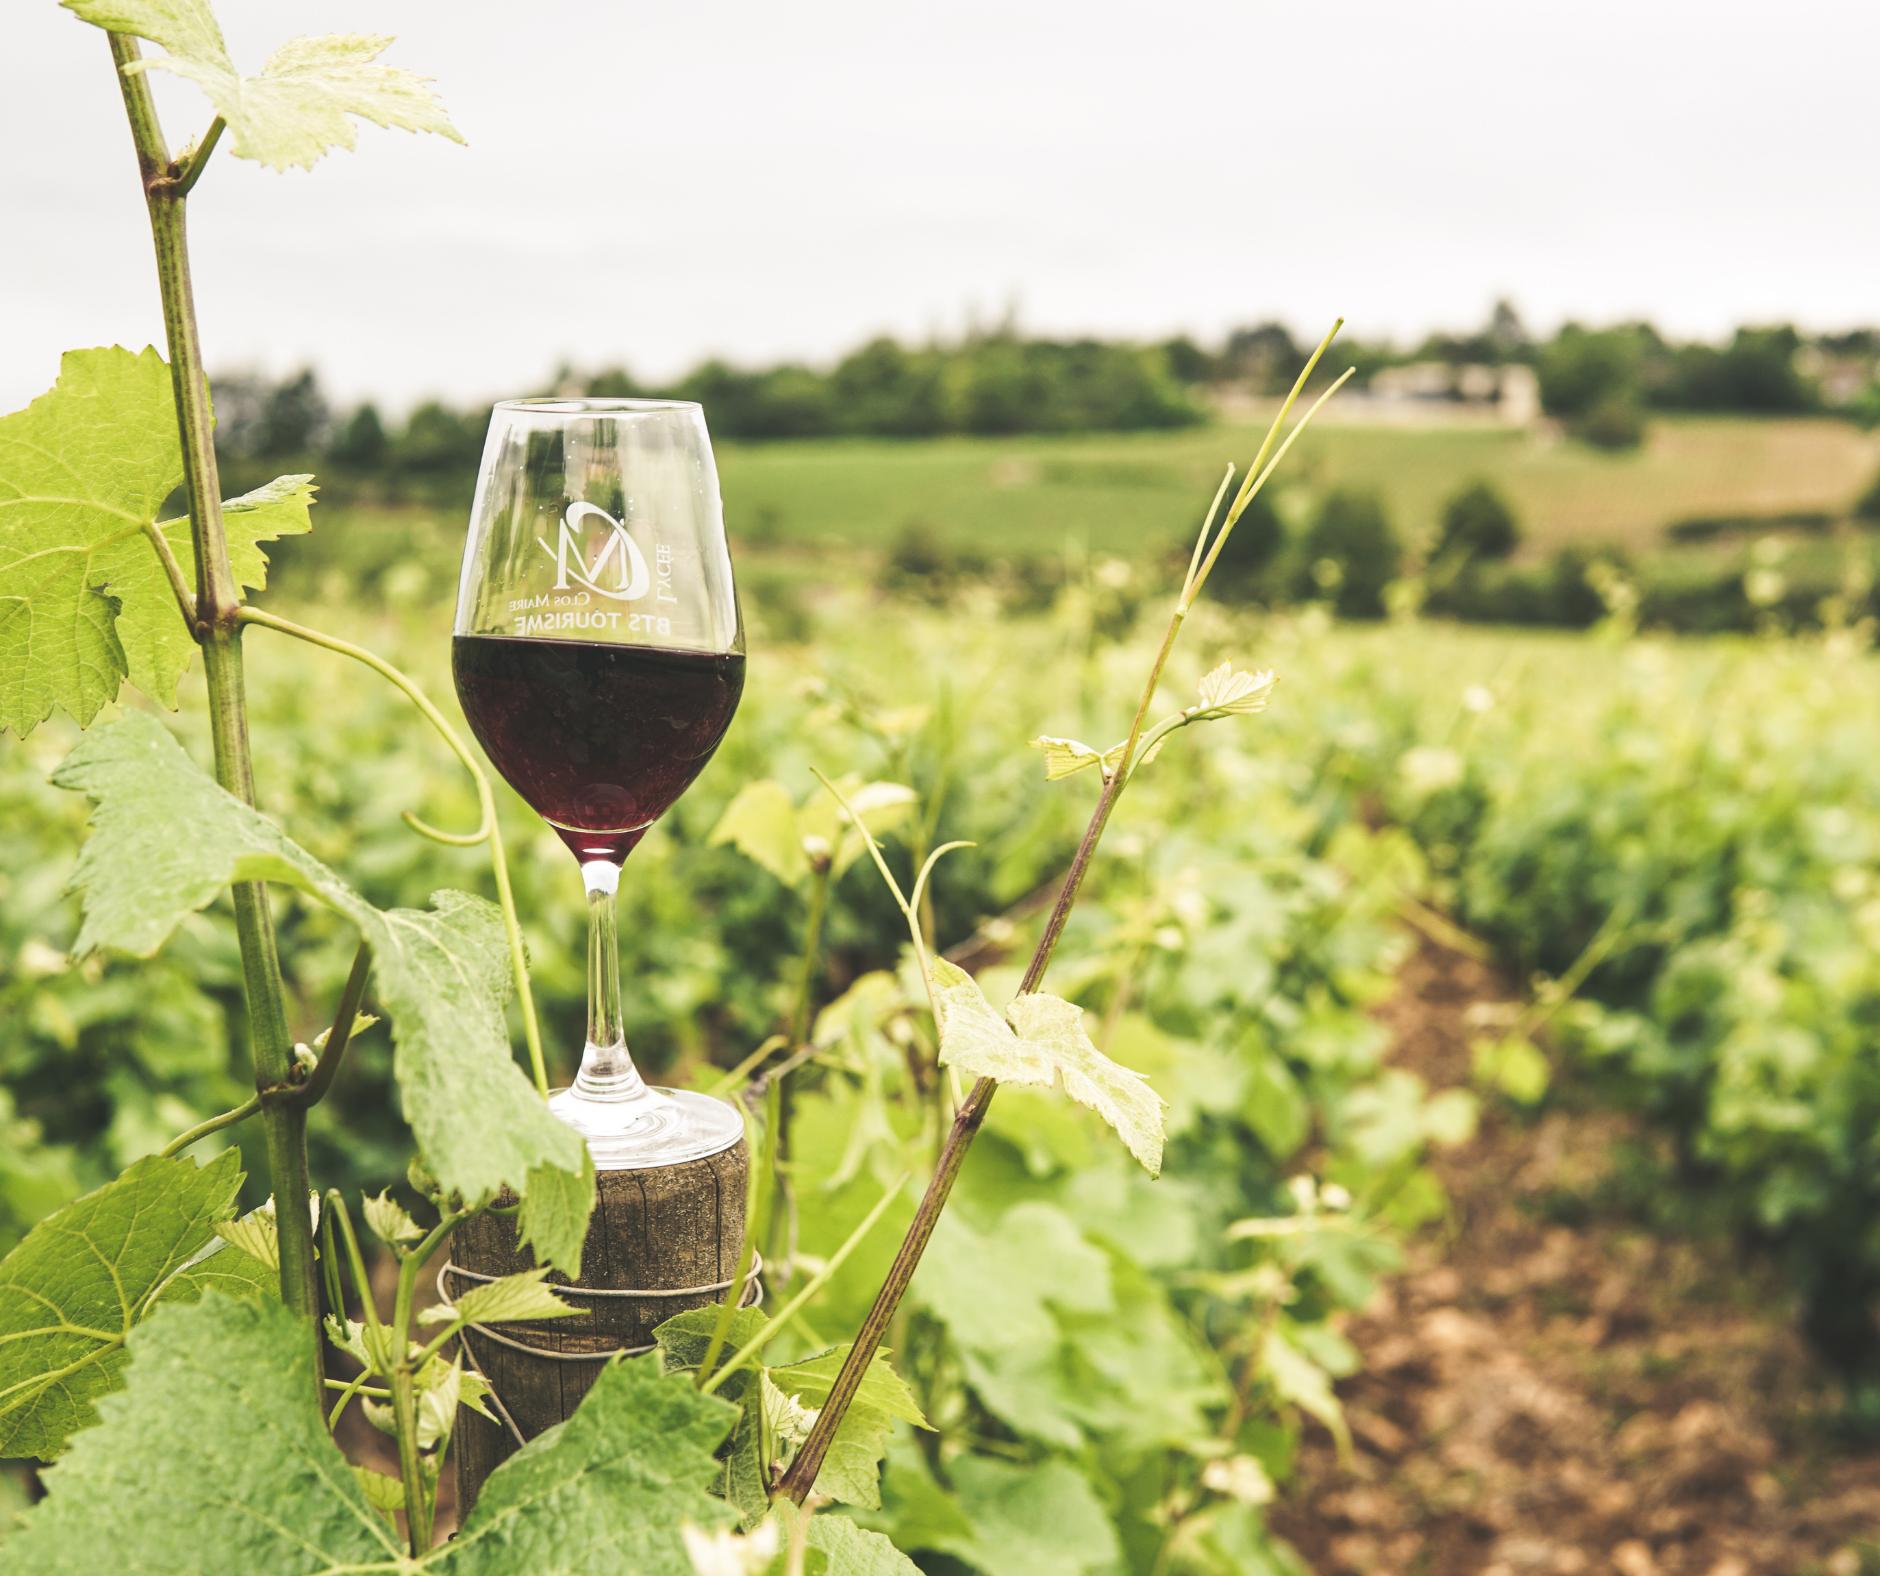 Glass of wine overlooking a vineyard